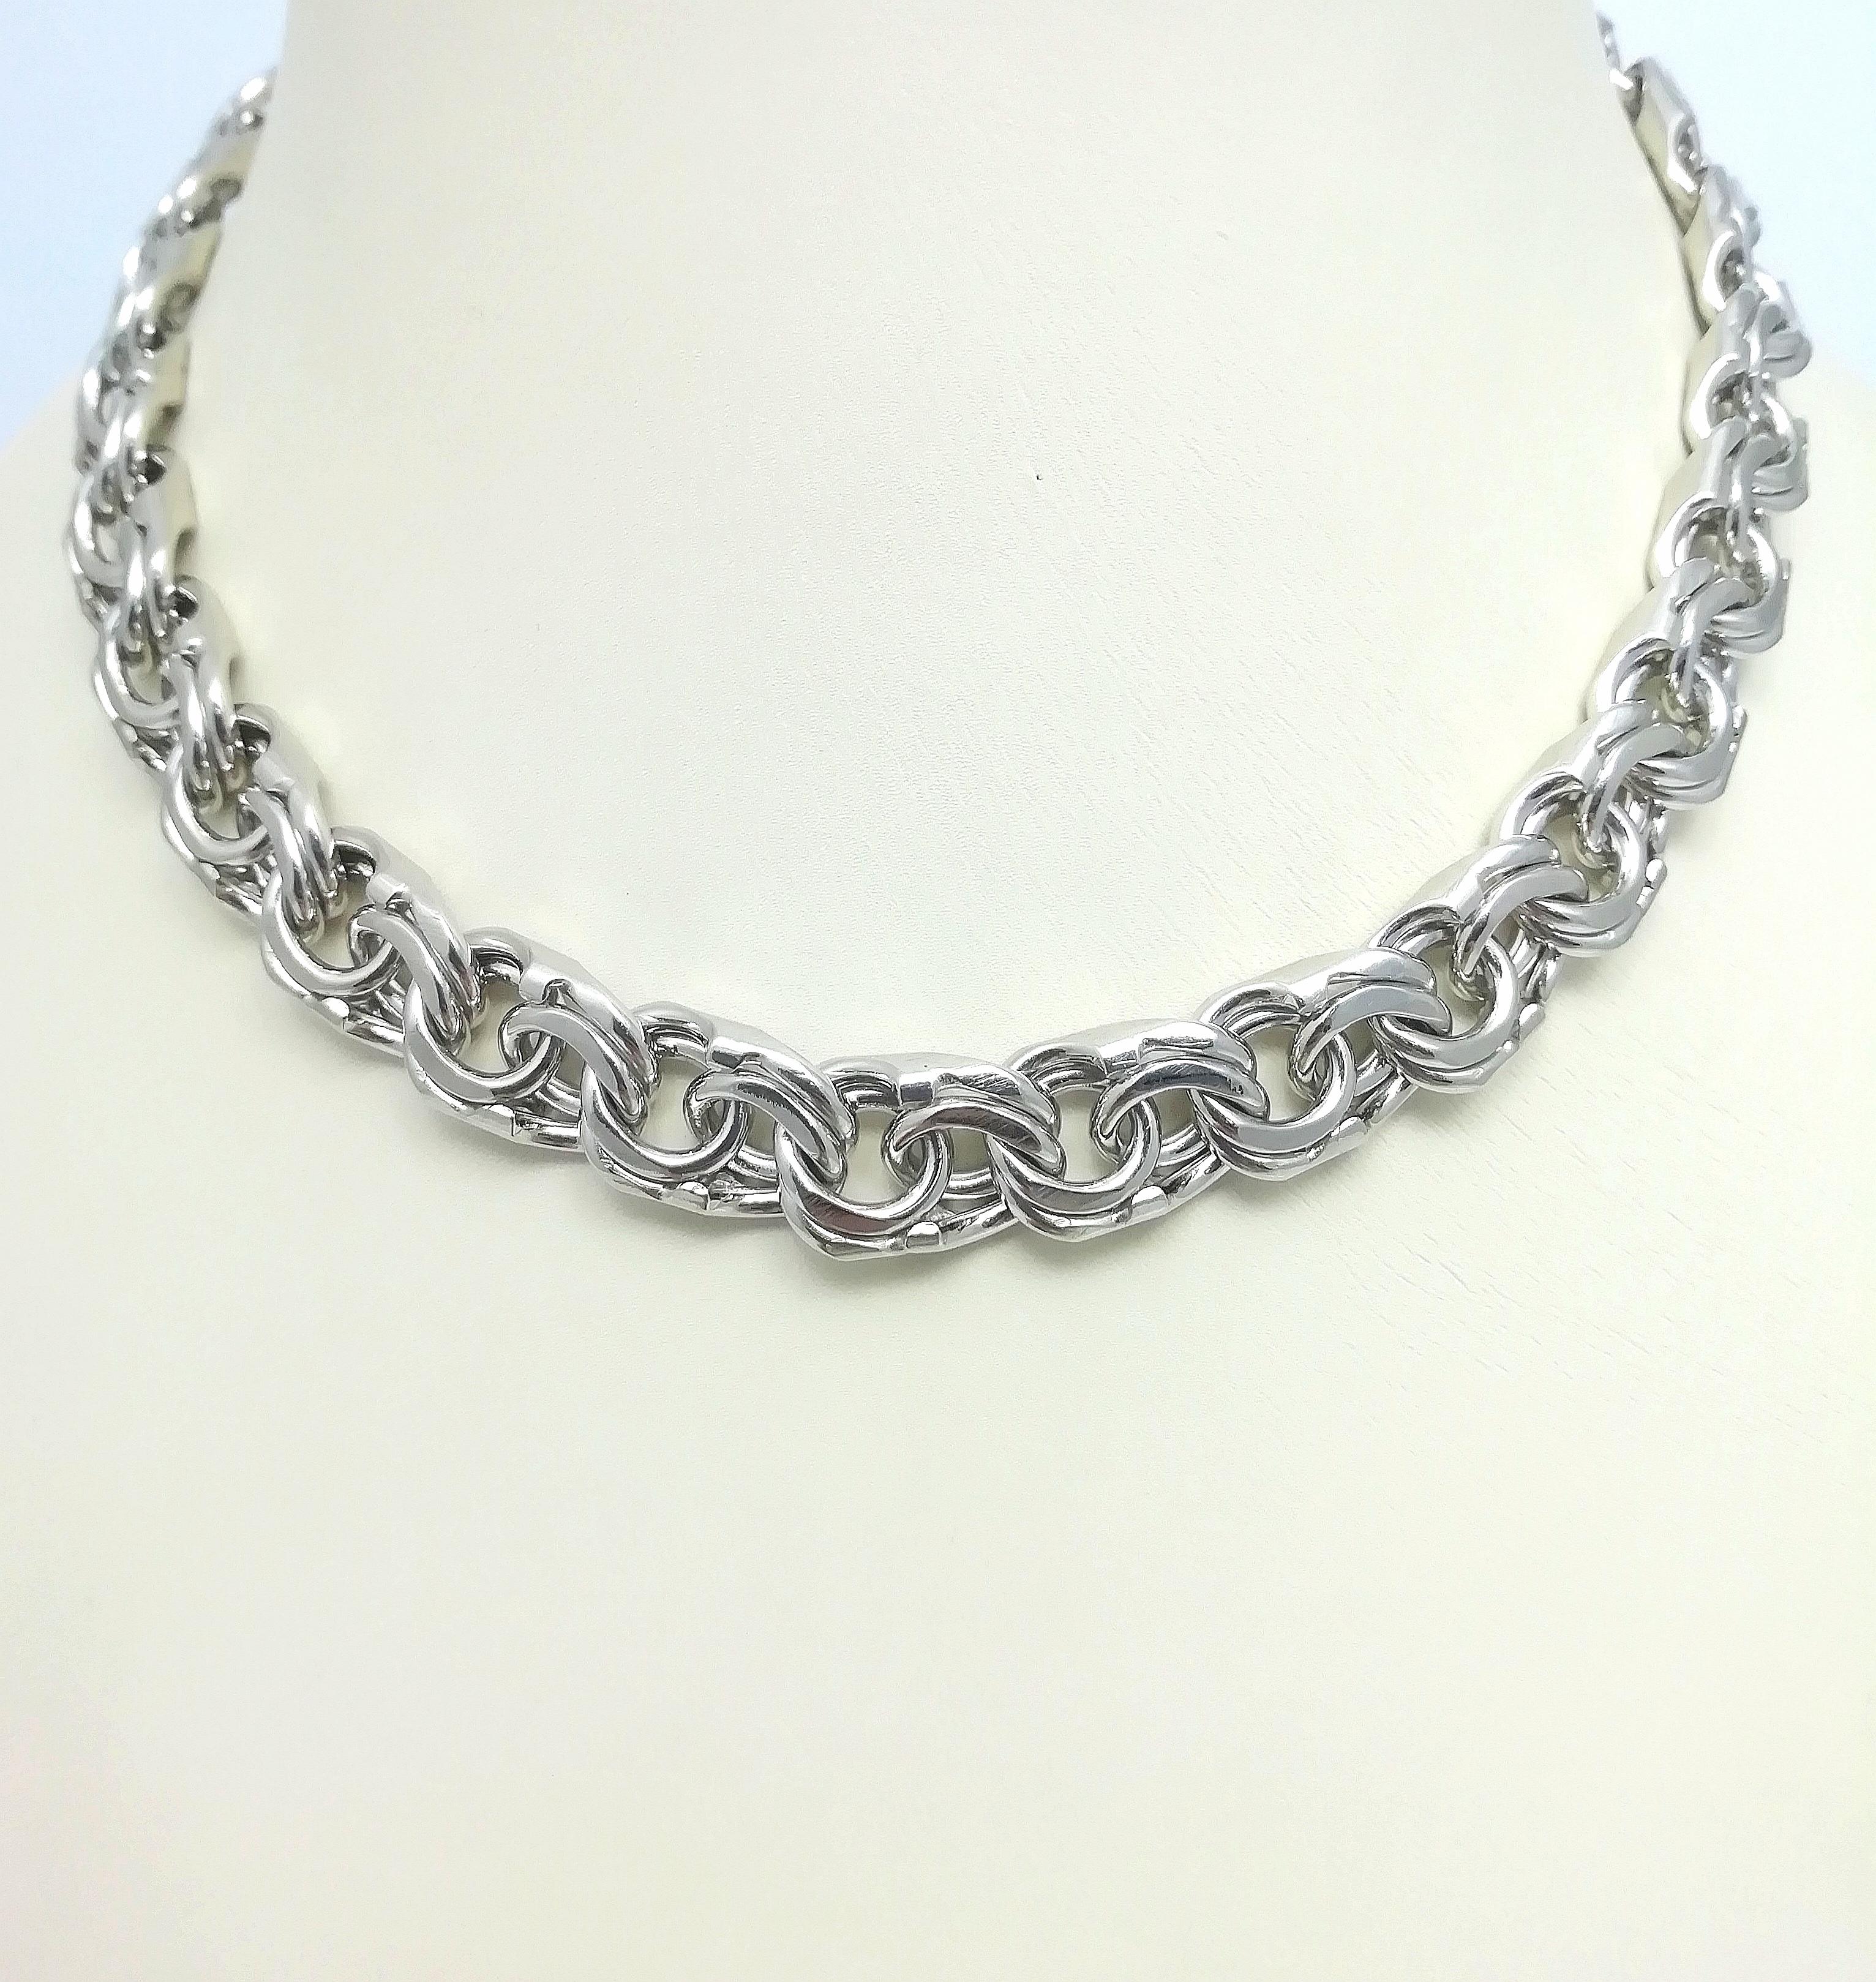 Серебро цепь дк240920-173 122,90гр